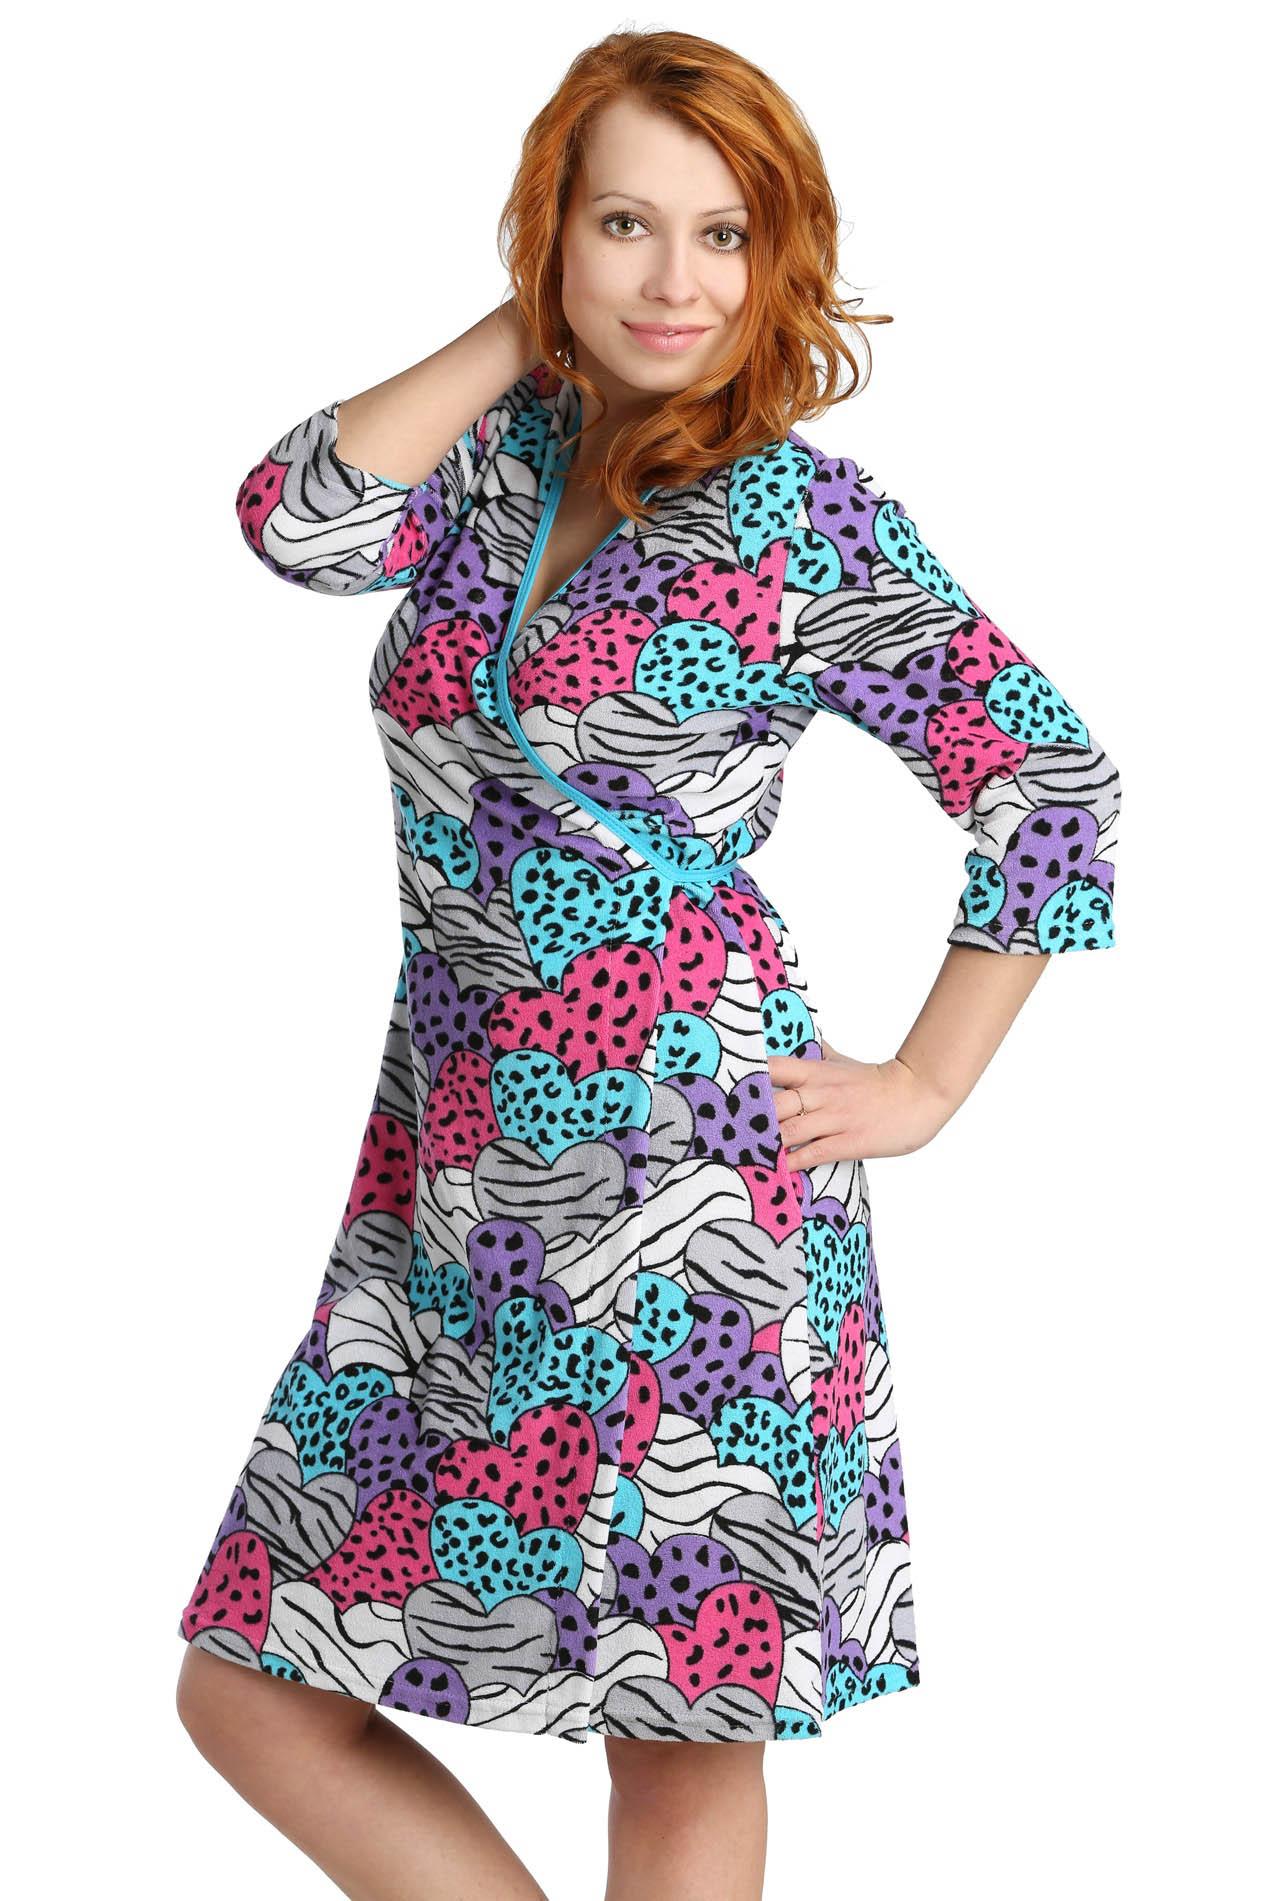 Домашние халаты ElenaTex Домашний халат Rosie Цвет: Голубой (xL) домашние халаты mia mia домашний халат yesenia xl